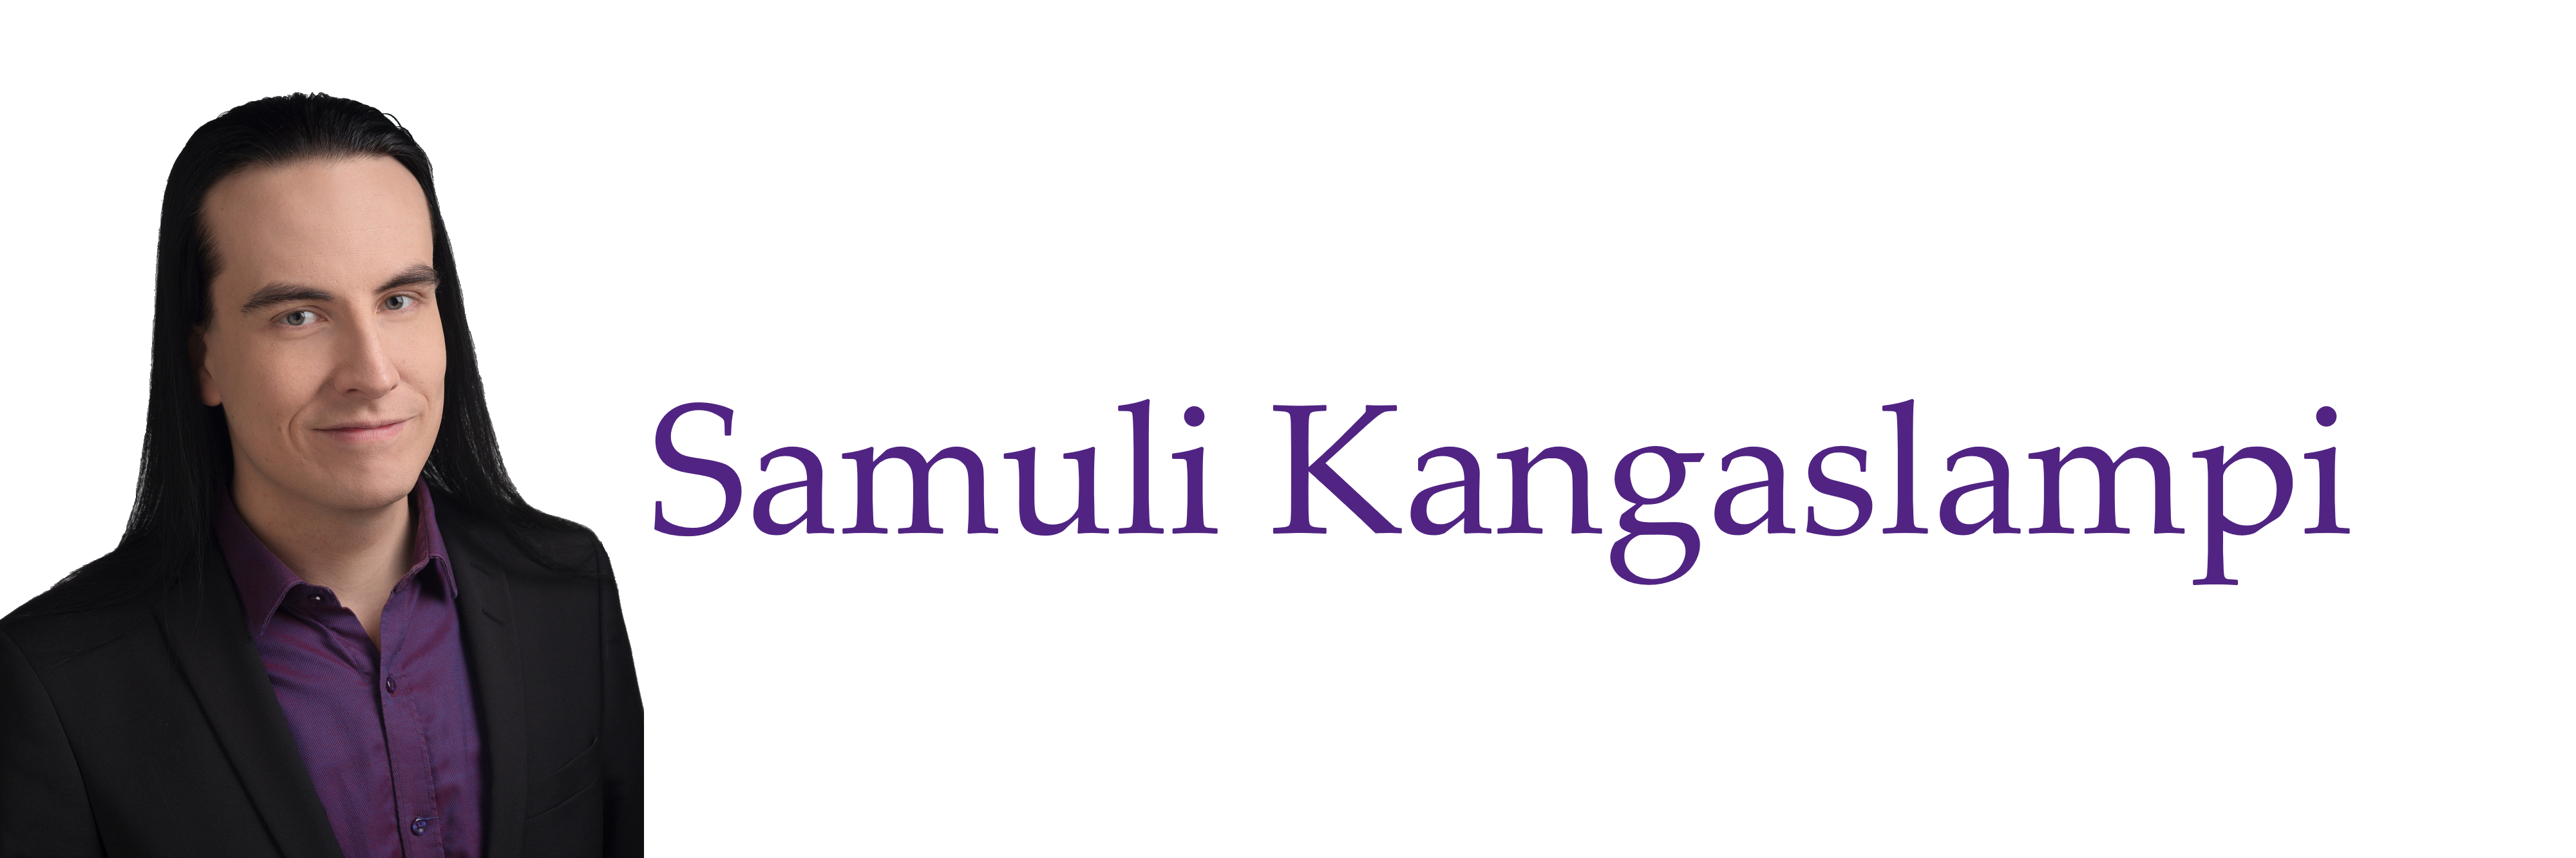 Samuli Kangaslampi